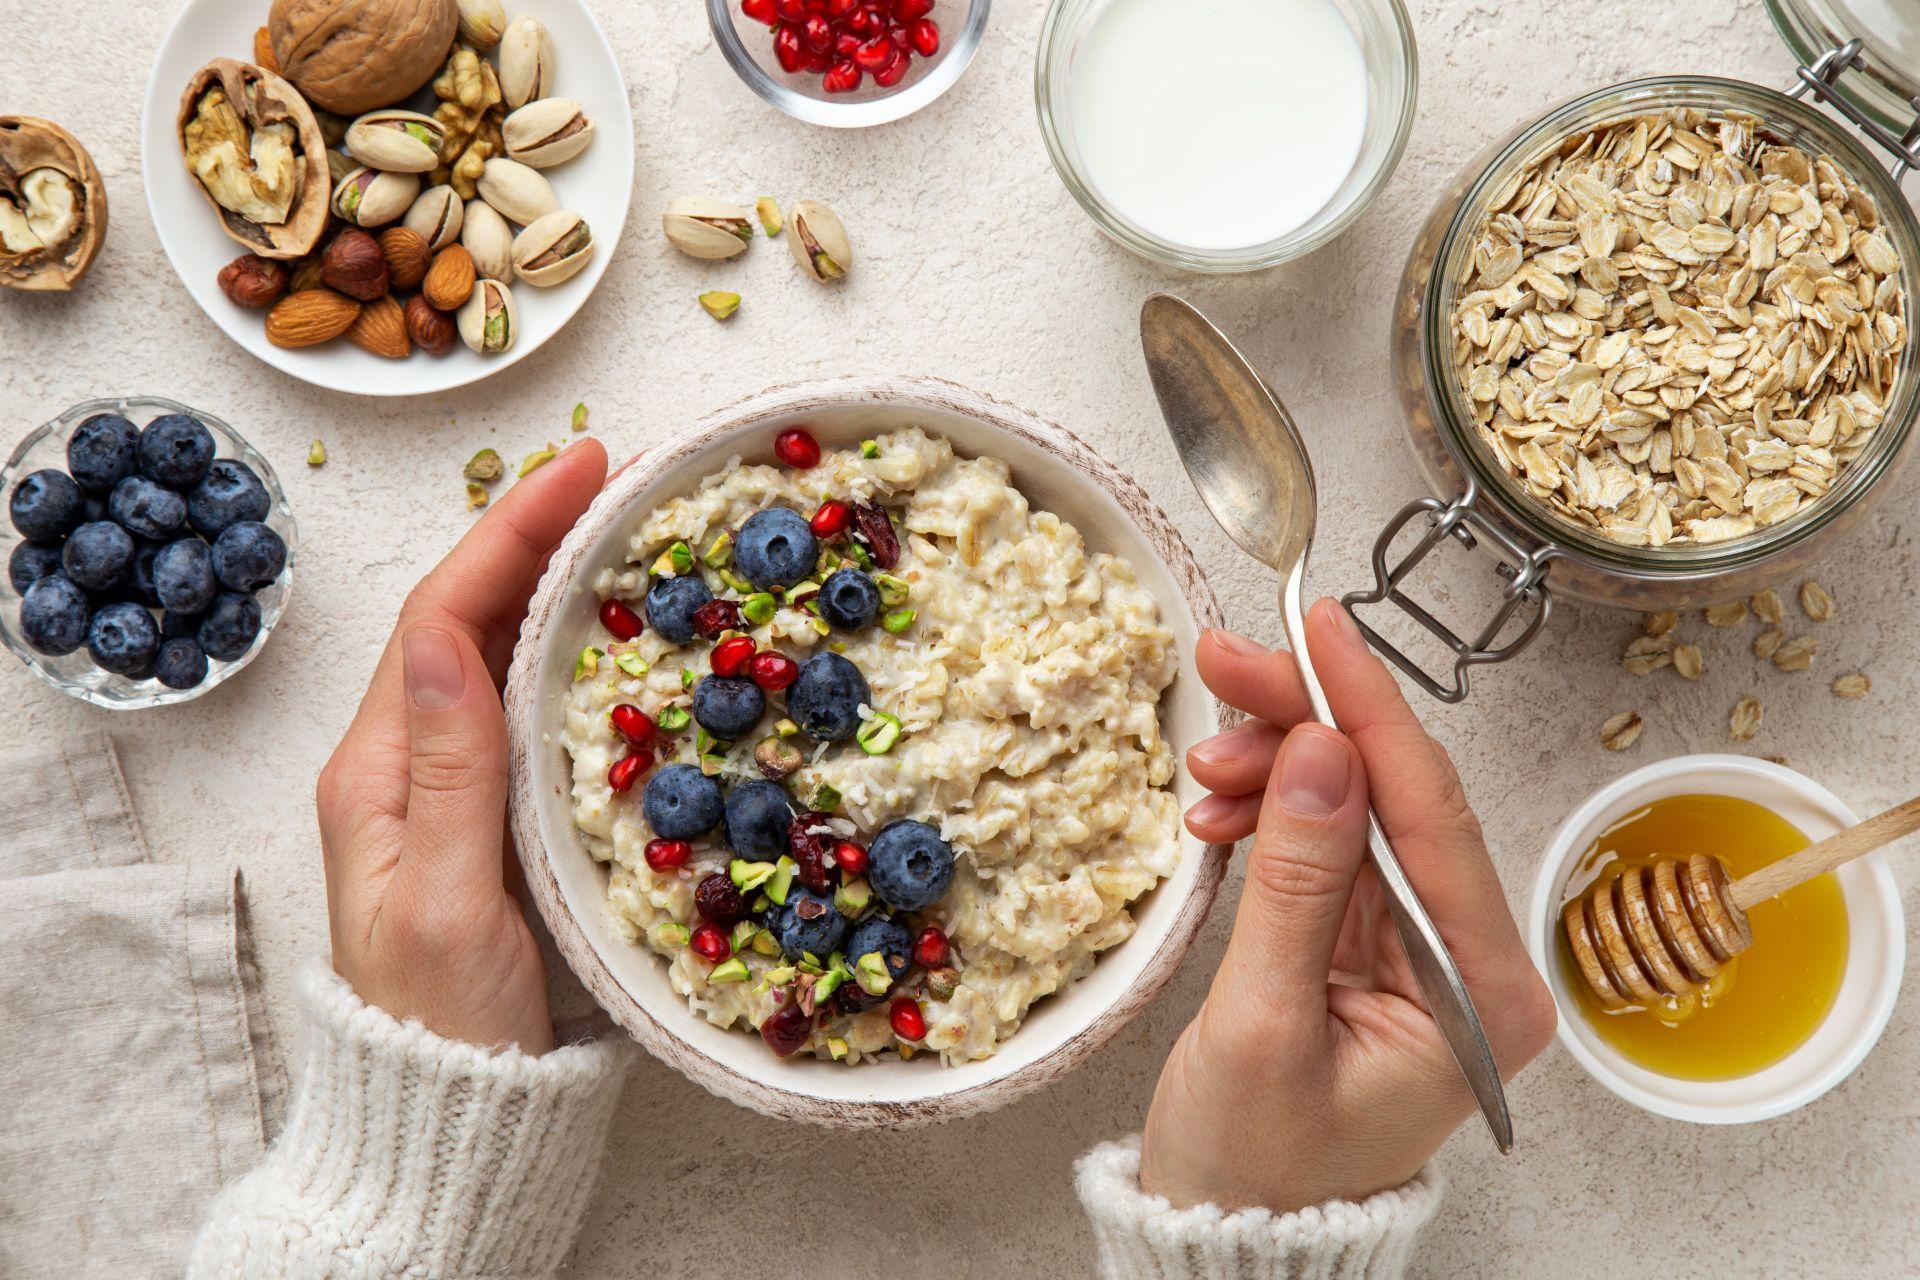 Dieta bogata w błonnik - owsianka wspomaga profilaktykę obniżania cholesterolu i pracy serca